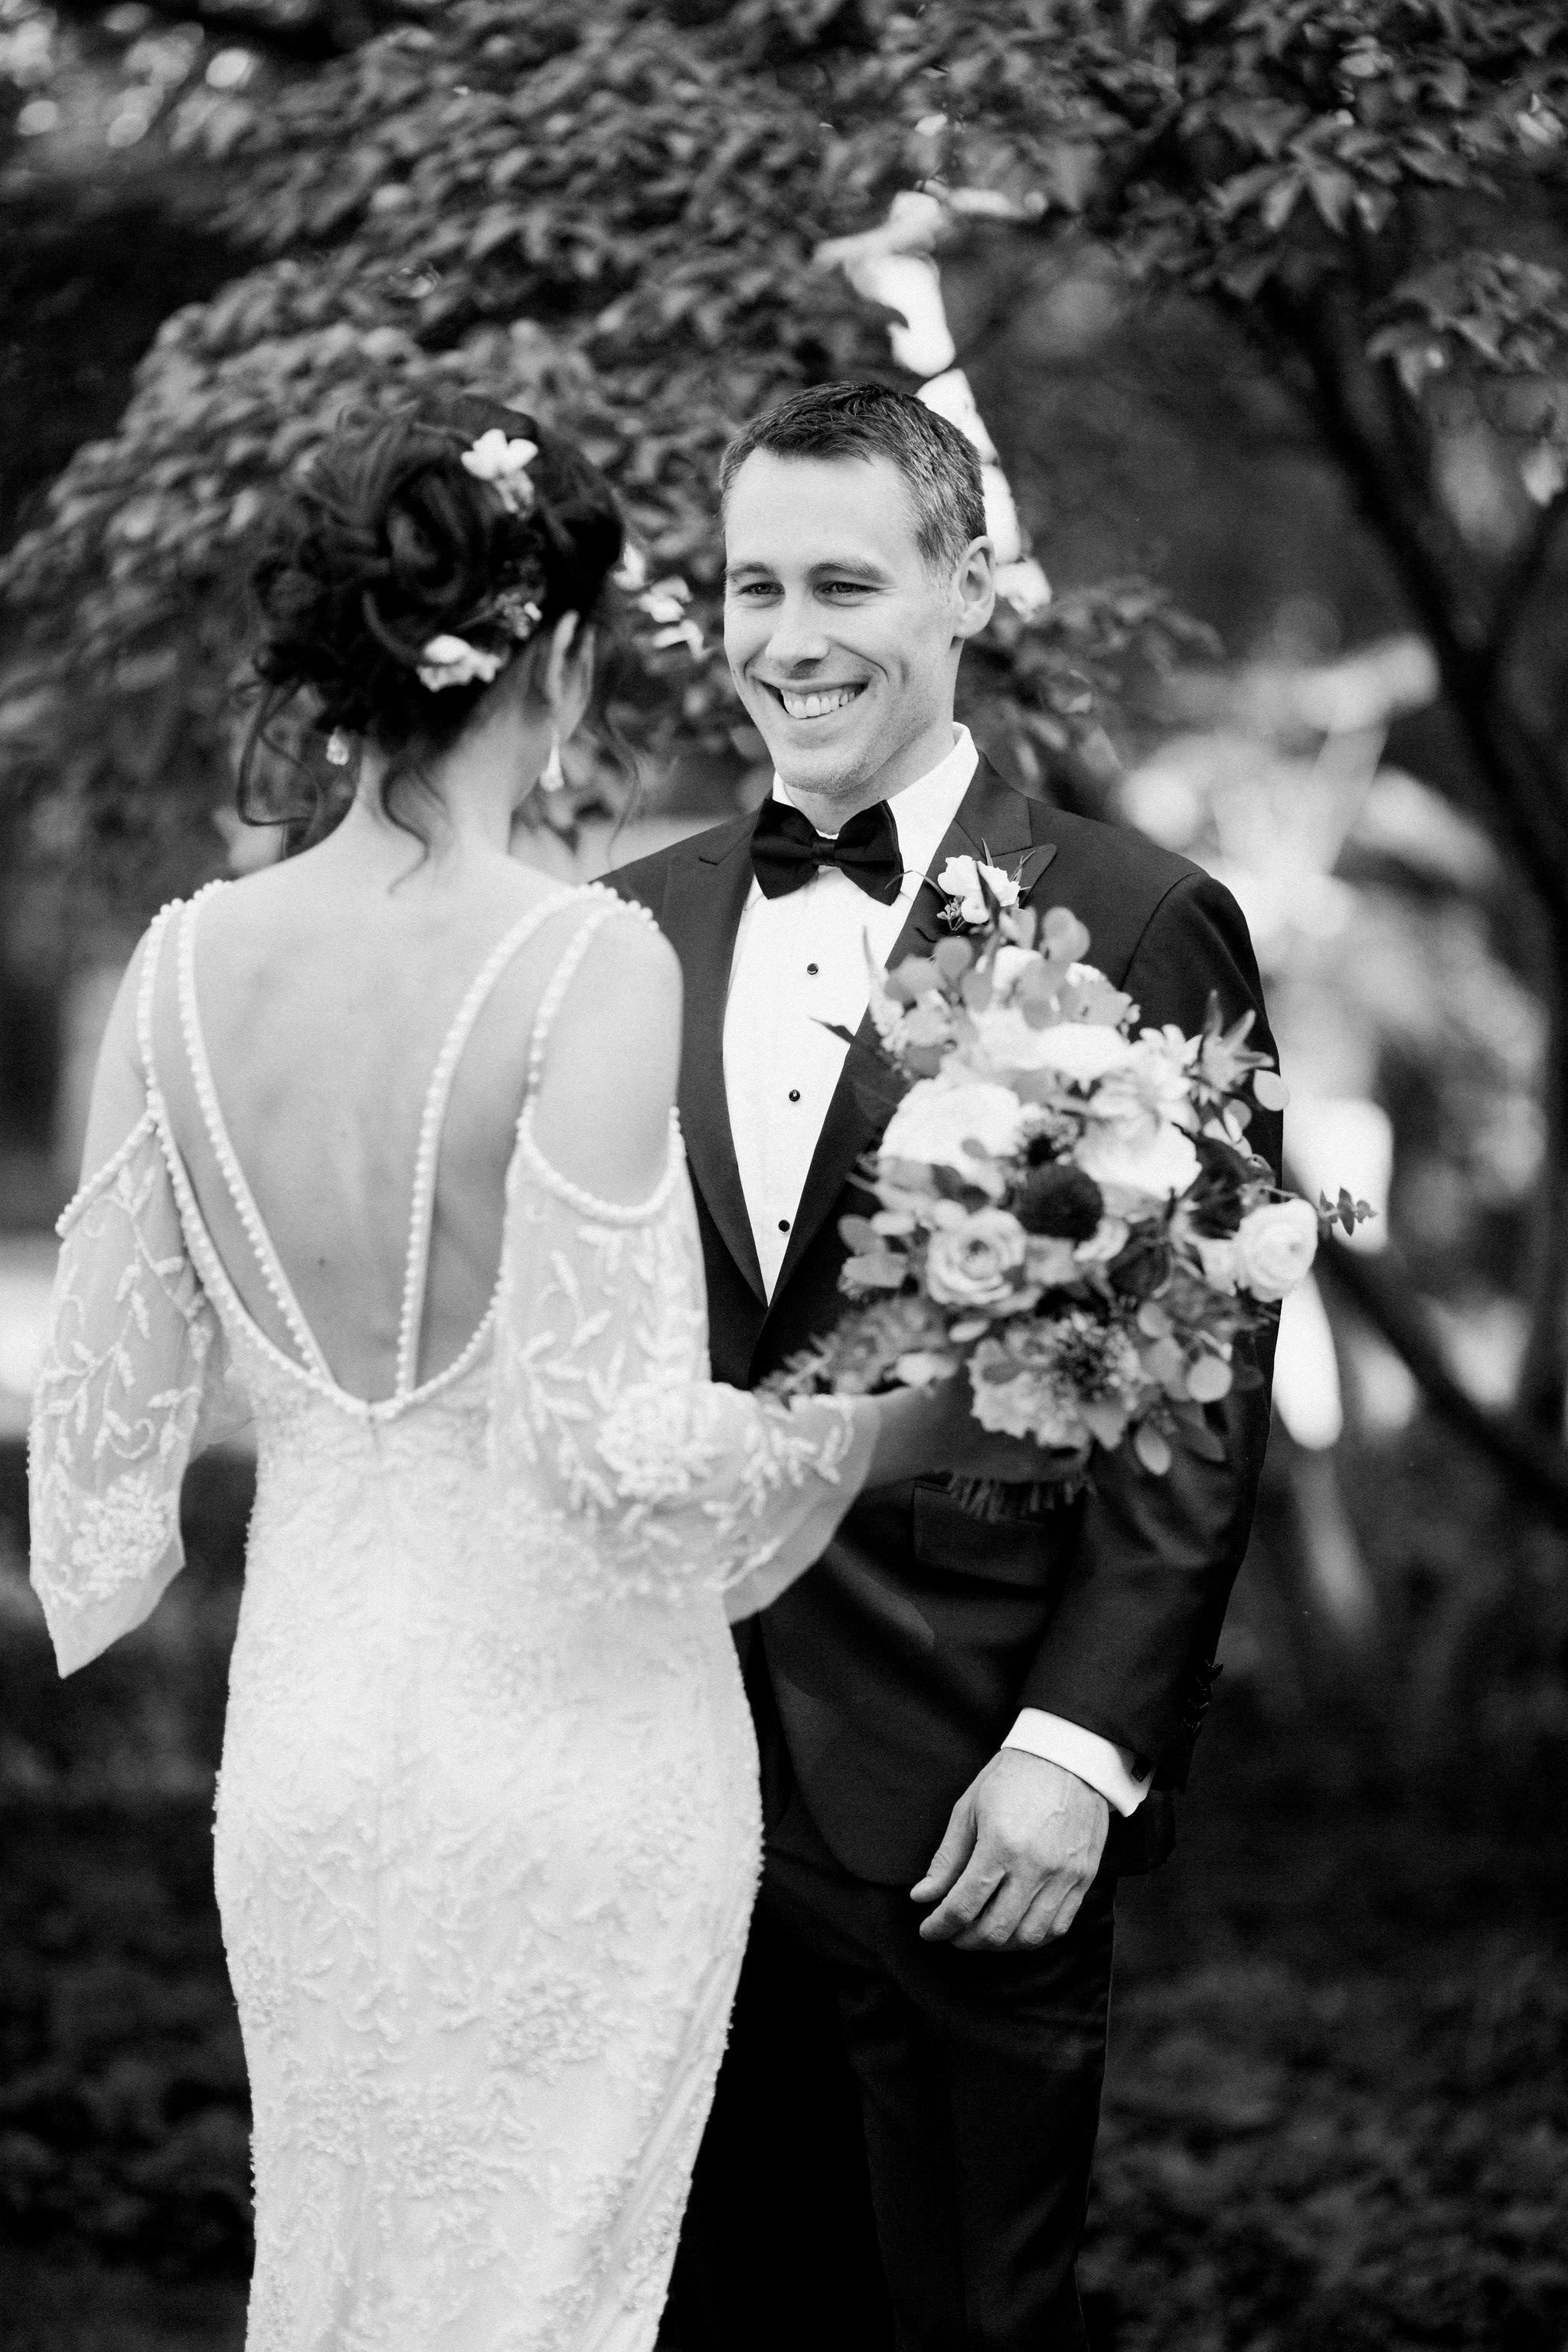 Stefanie-Stefan-Wedding-358.jpg